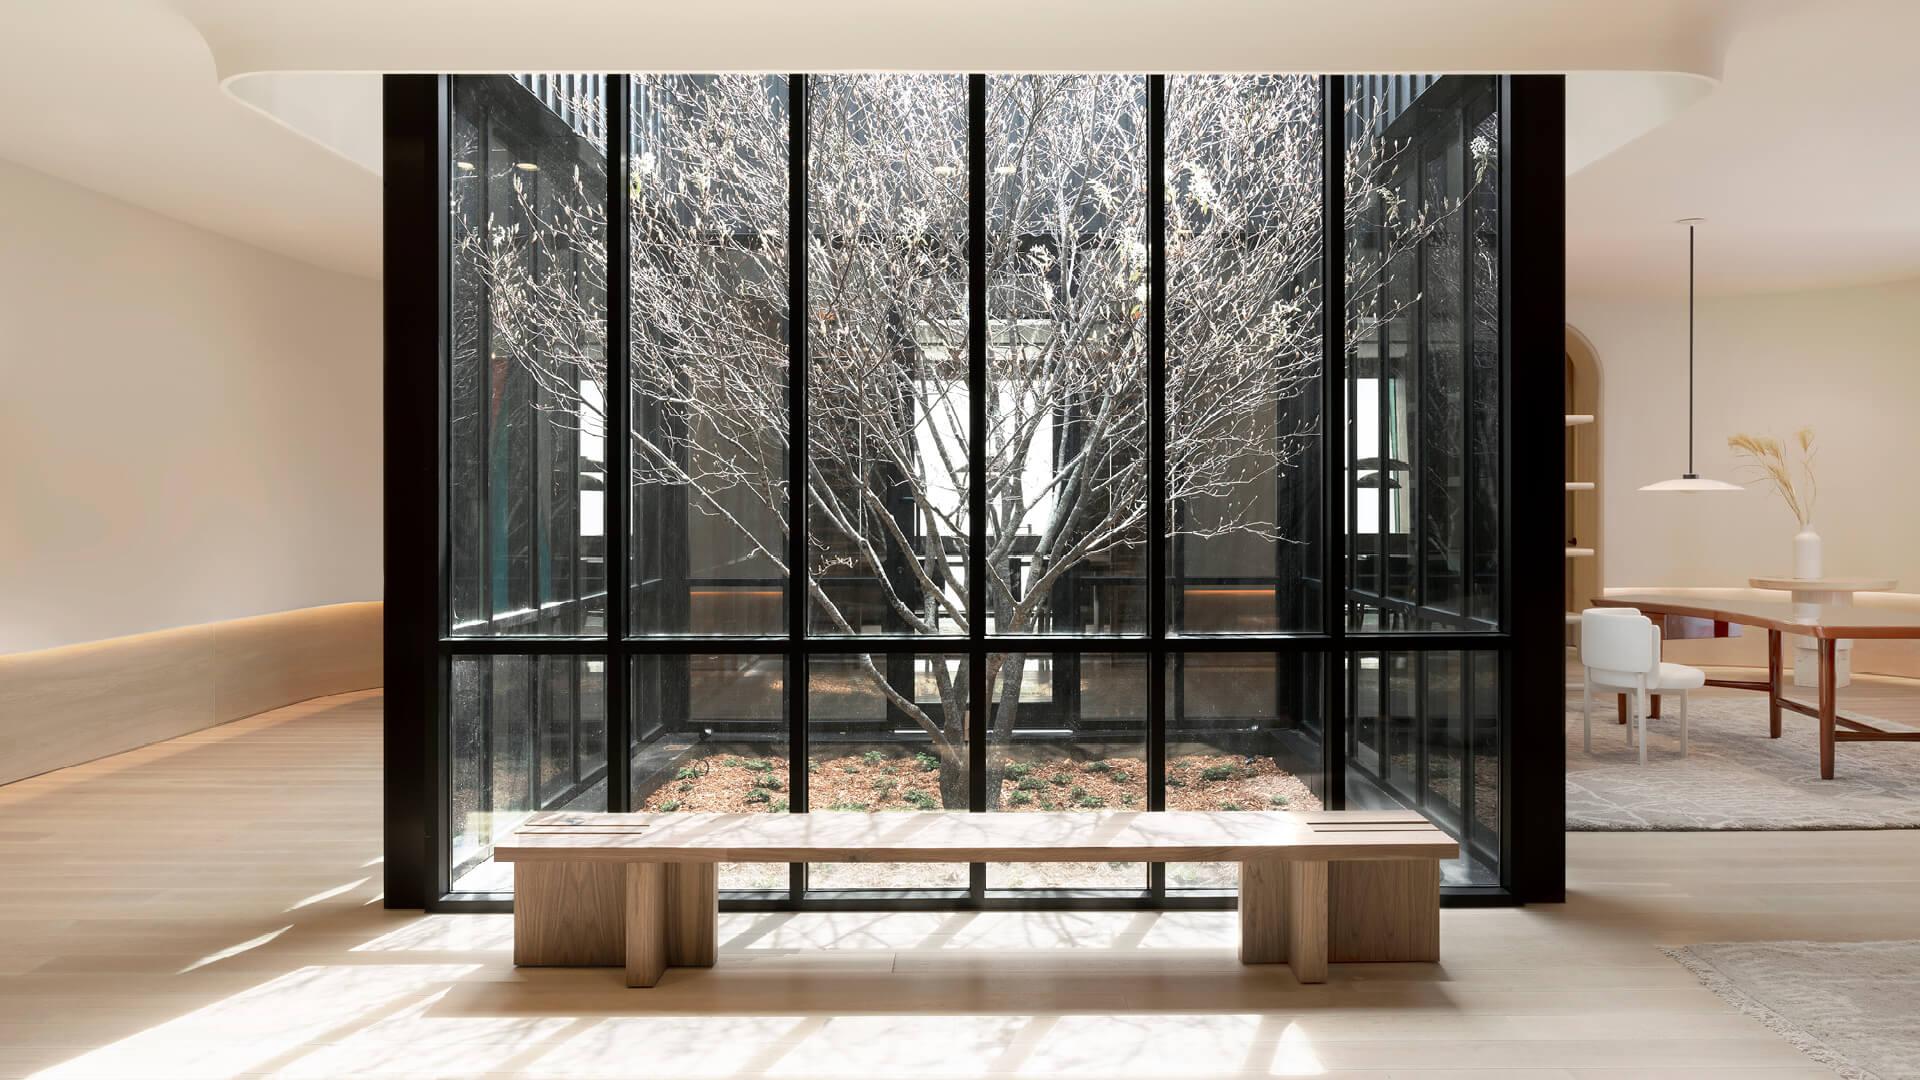 Zibi House designed around the Shadblow tree in its courtyard | Zibi House by Studio Paolo Ferrari | STIRworld